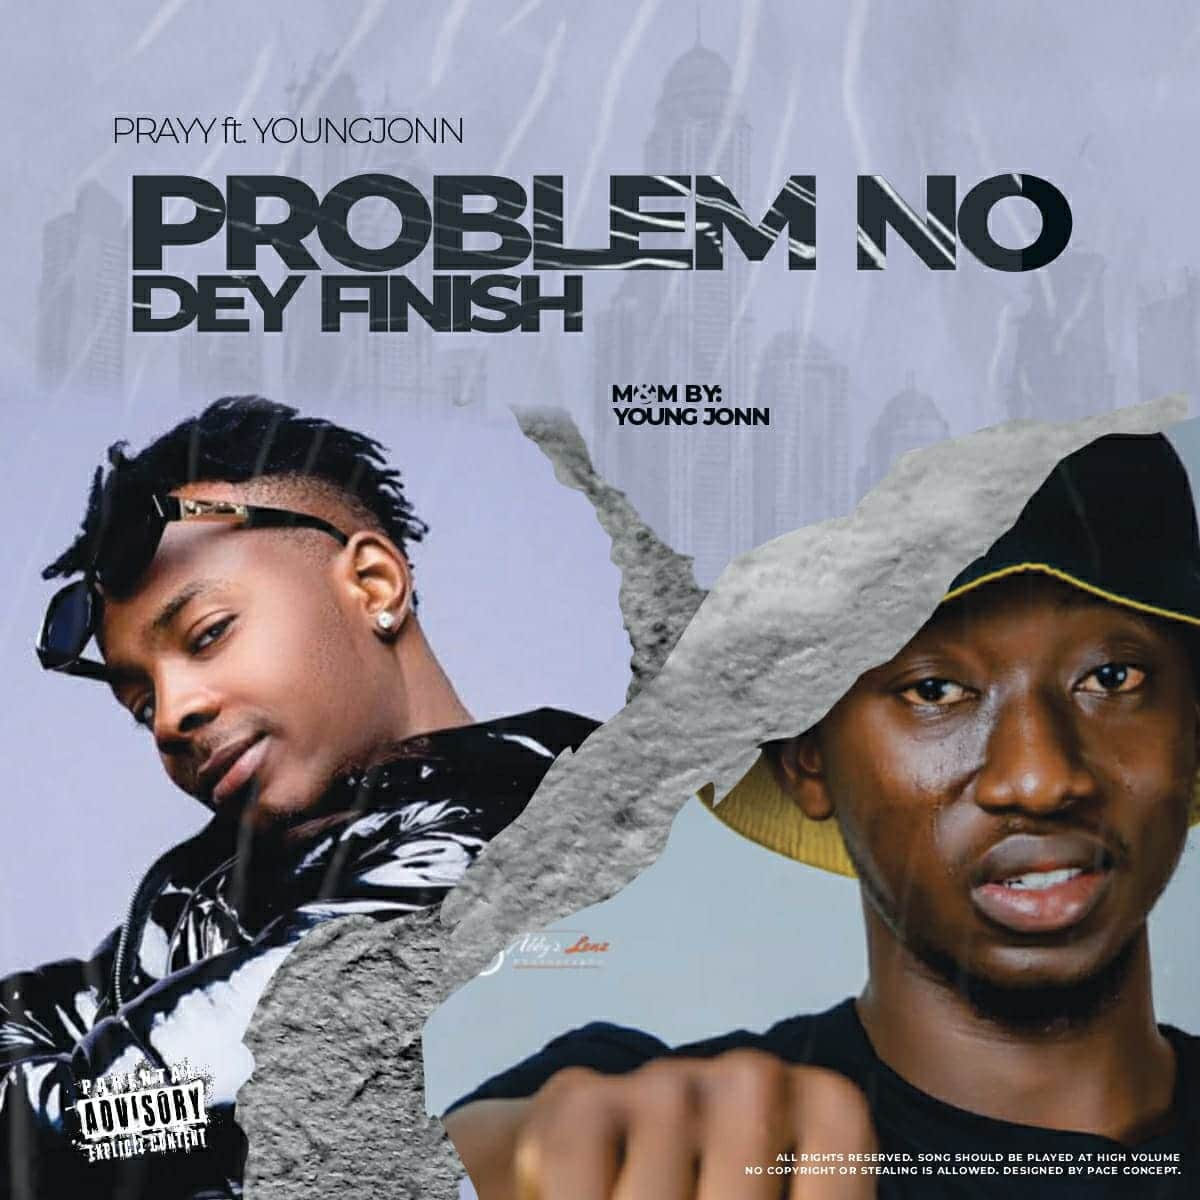 [MUSIC] PRAYY FT YOUNGJOHN – PROBLEM NO DEY FINISH